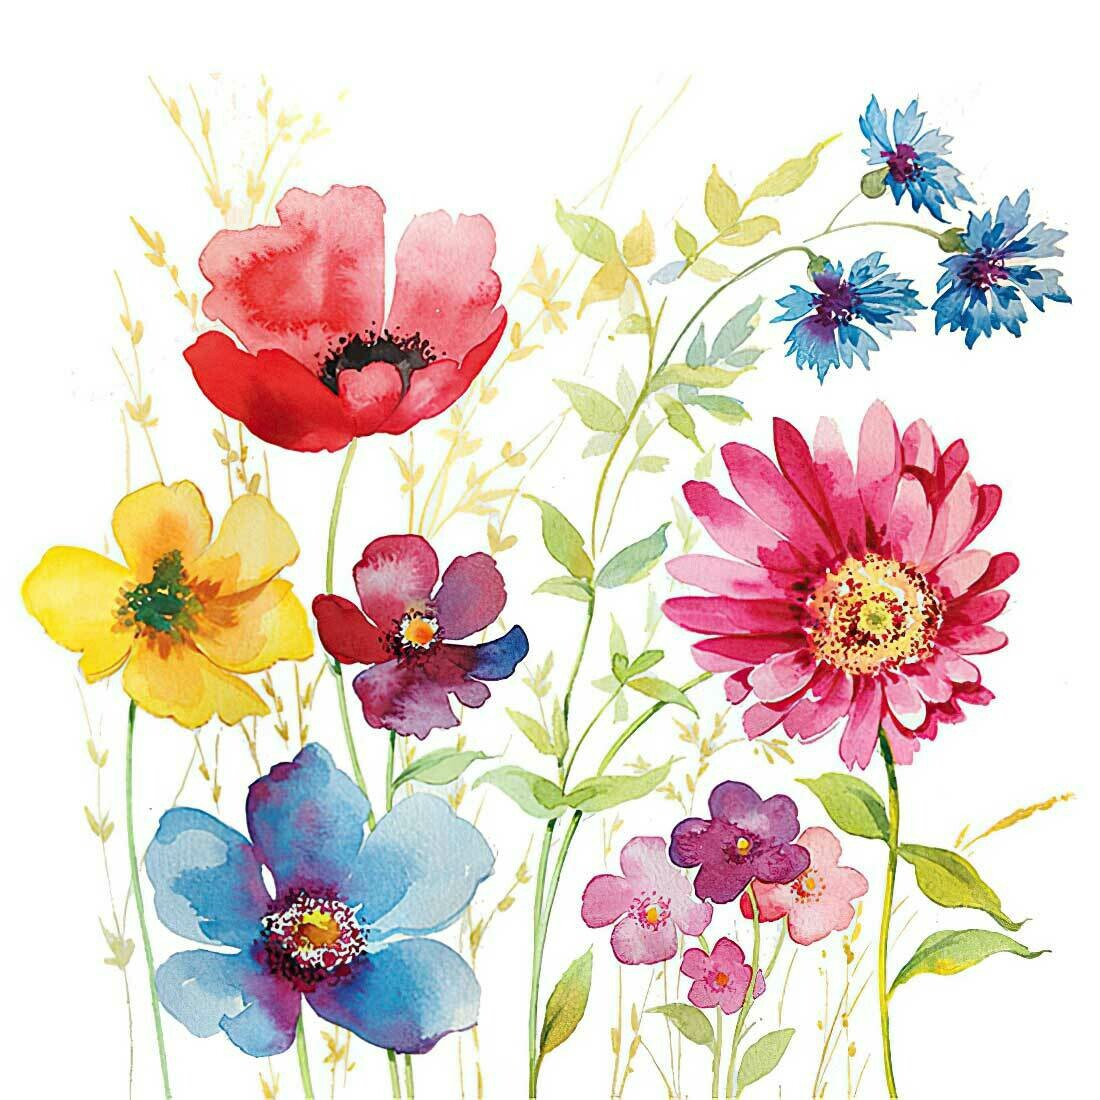 Decoupage Paper Napkins - Floral - Aquarell Meadow 13x13 (1 Sheet)